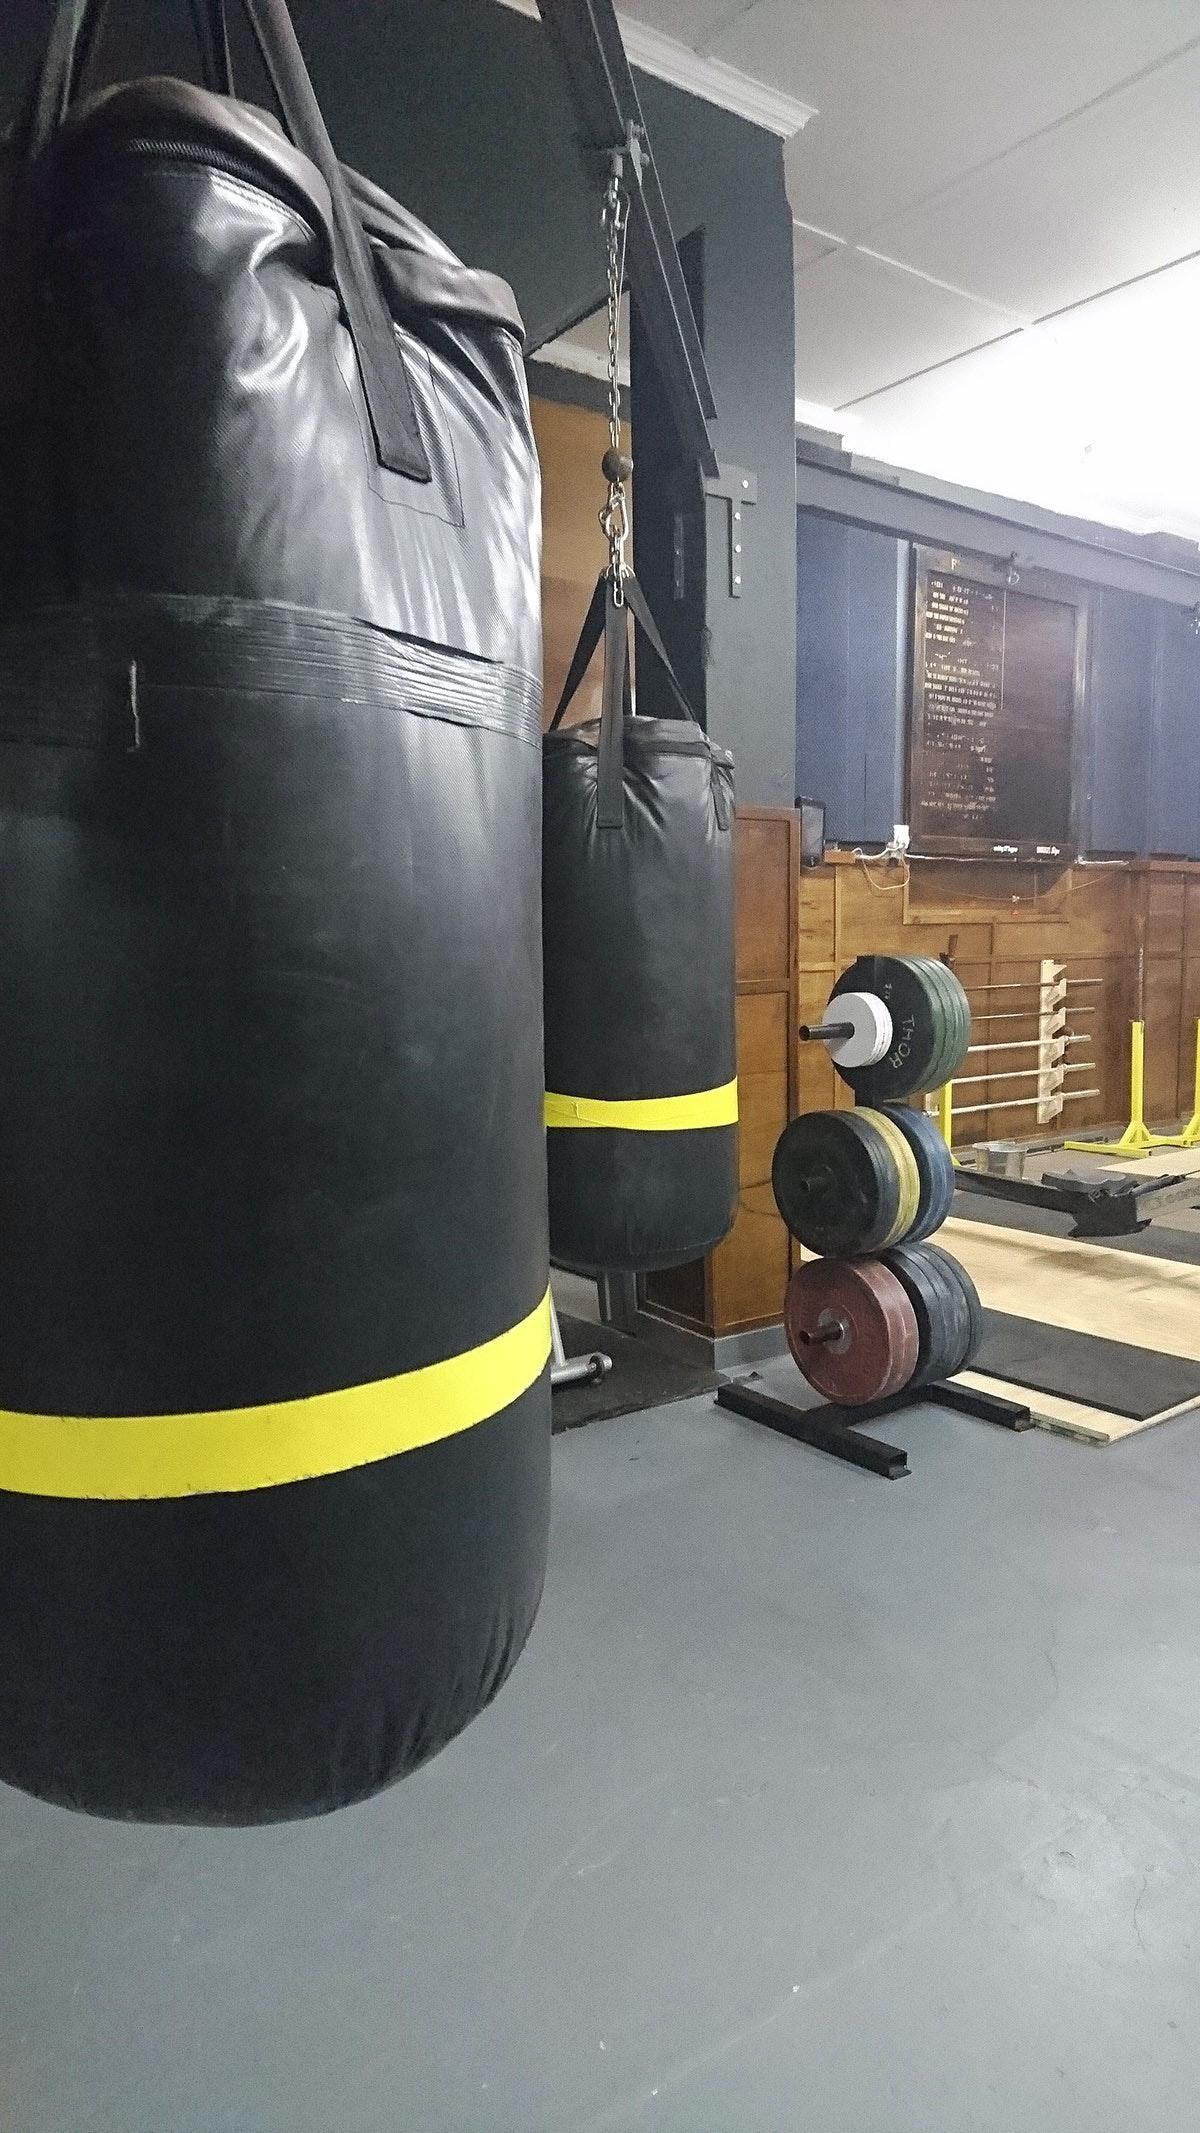 East City Boxing